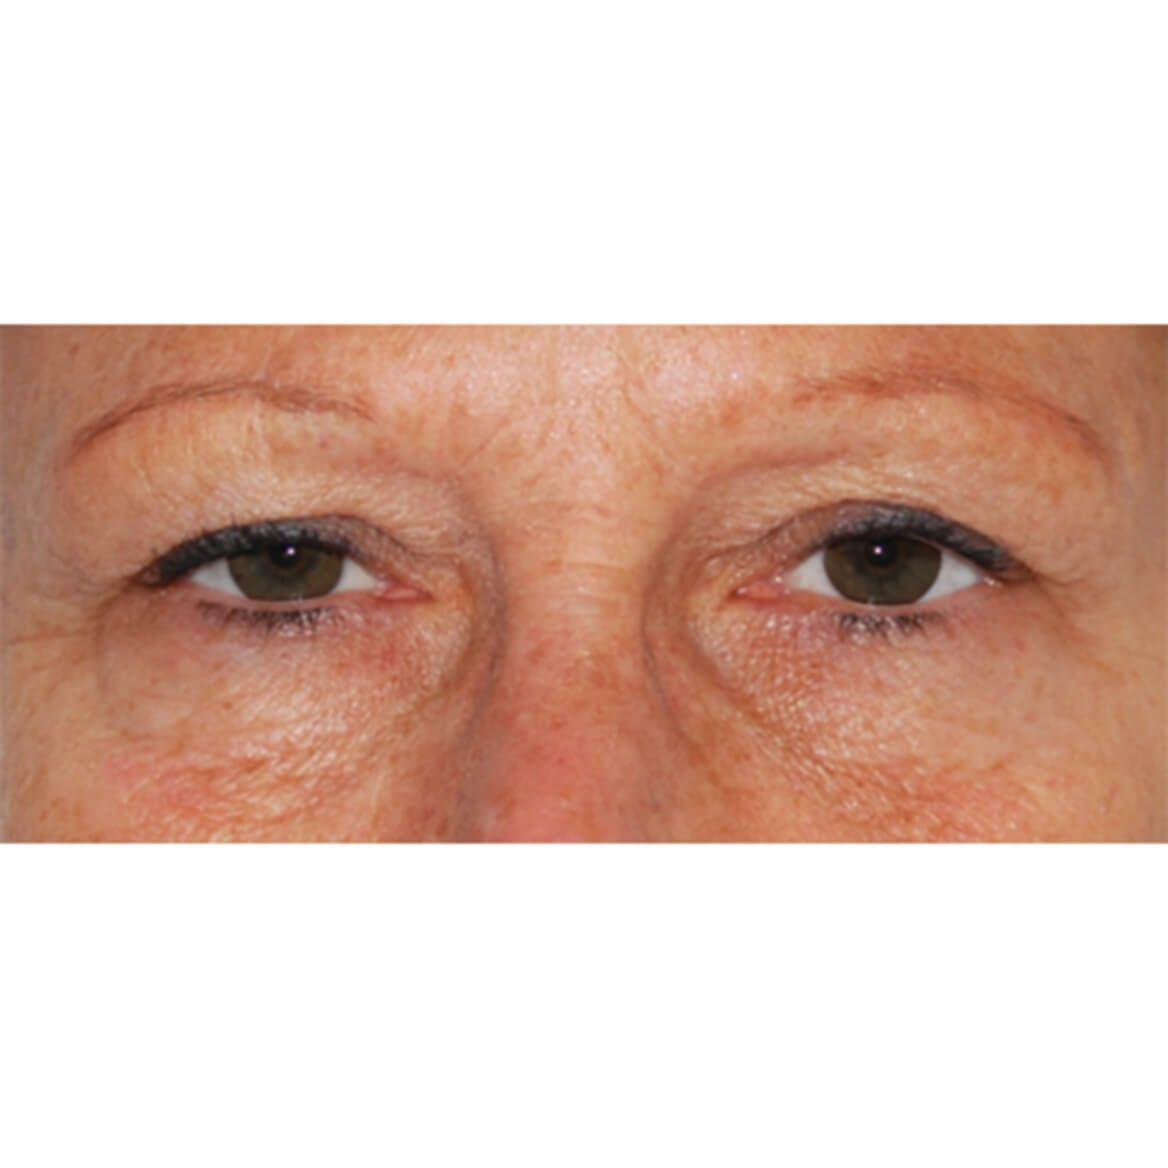 DermeCeuticals Corrective Firming Eyelid Lift-369216